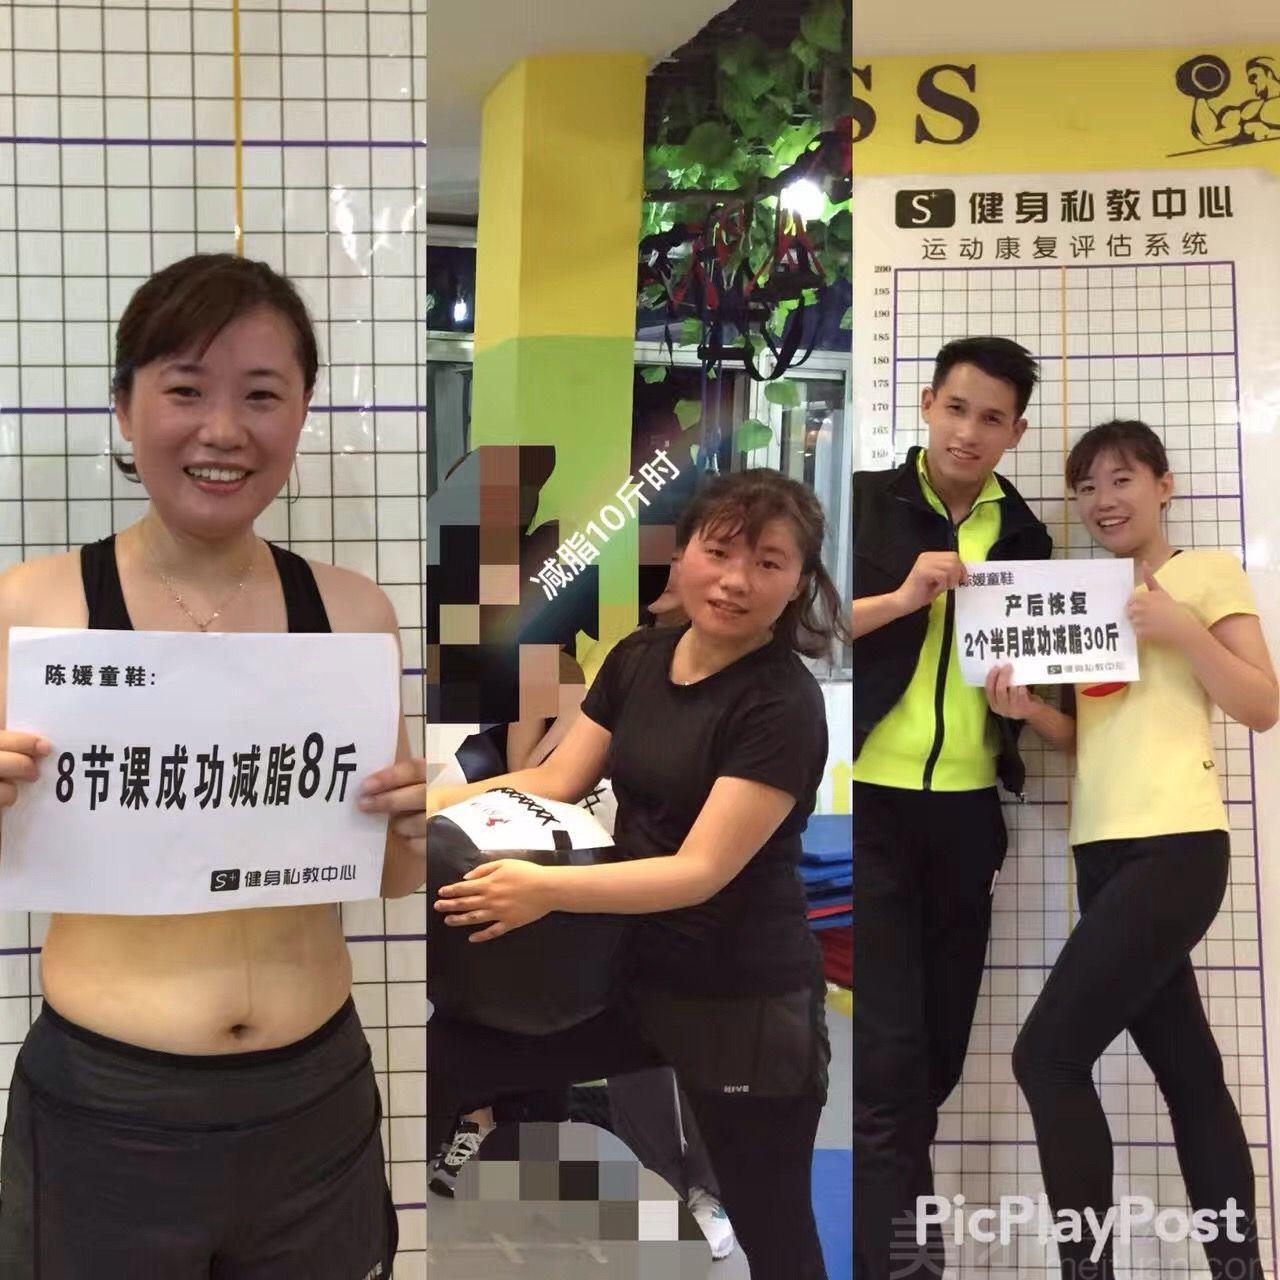 S+健身私教中心(天泽园店)怎么样_团购S+健身